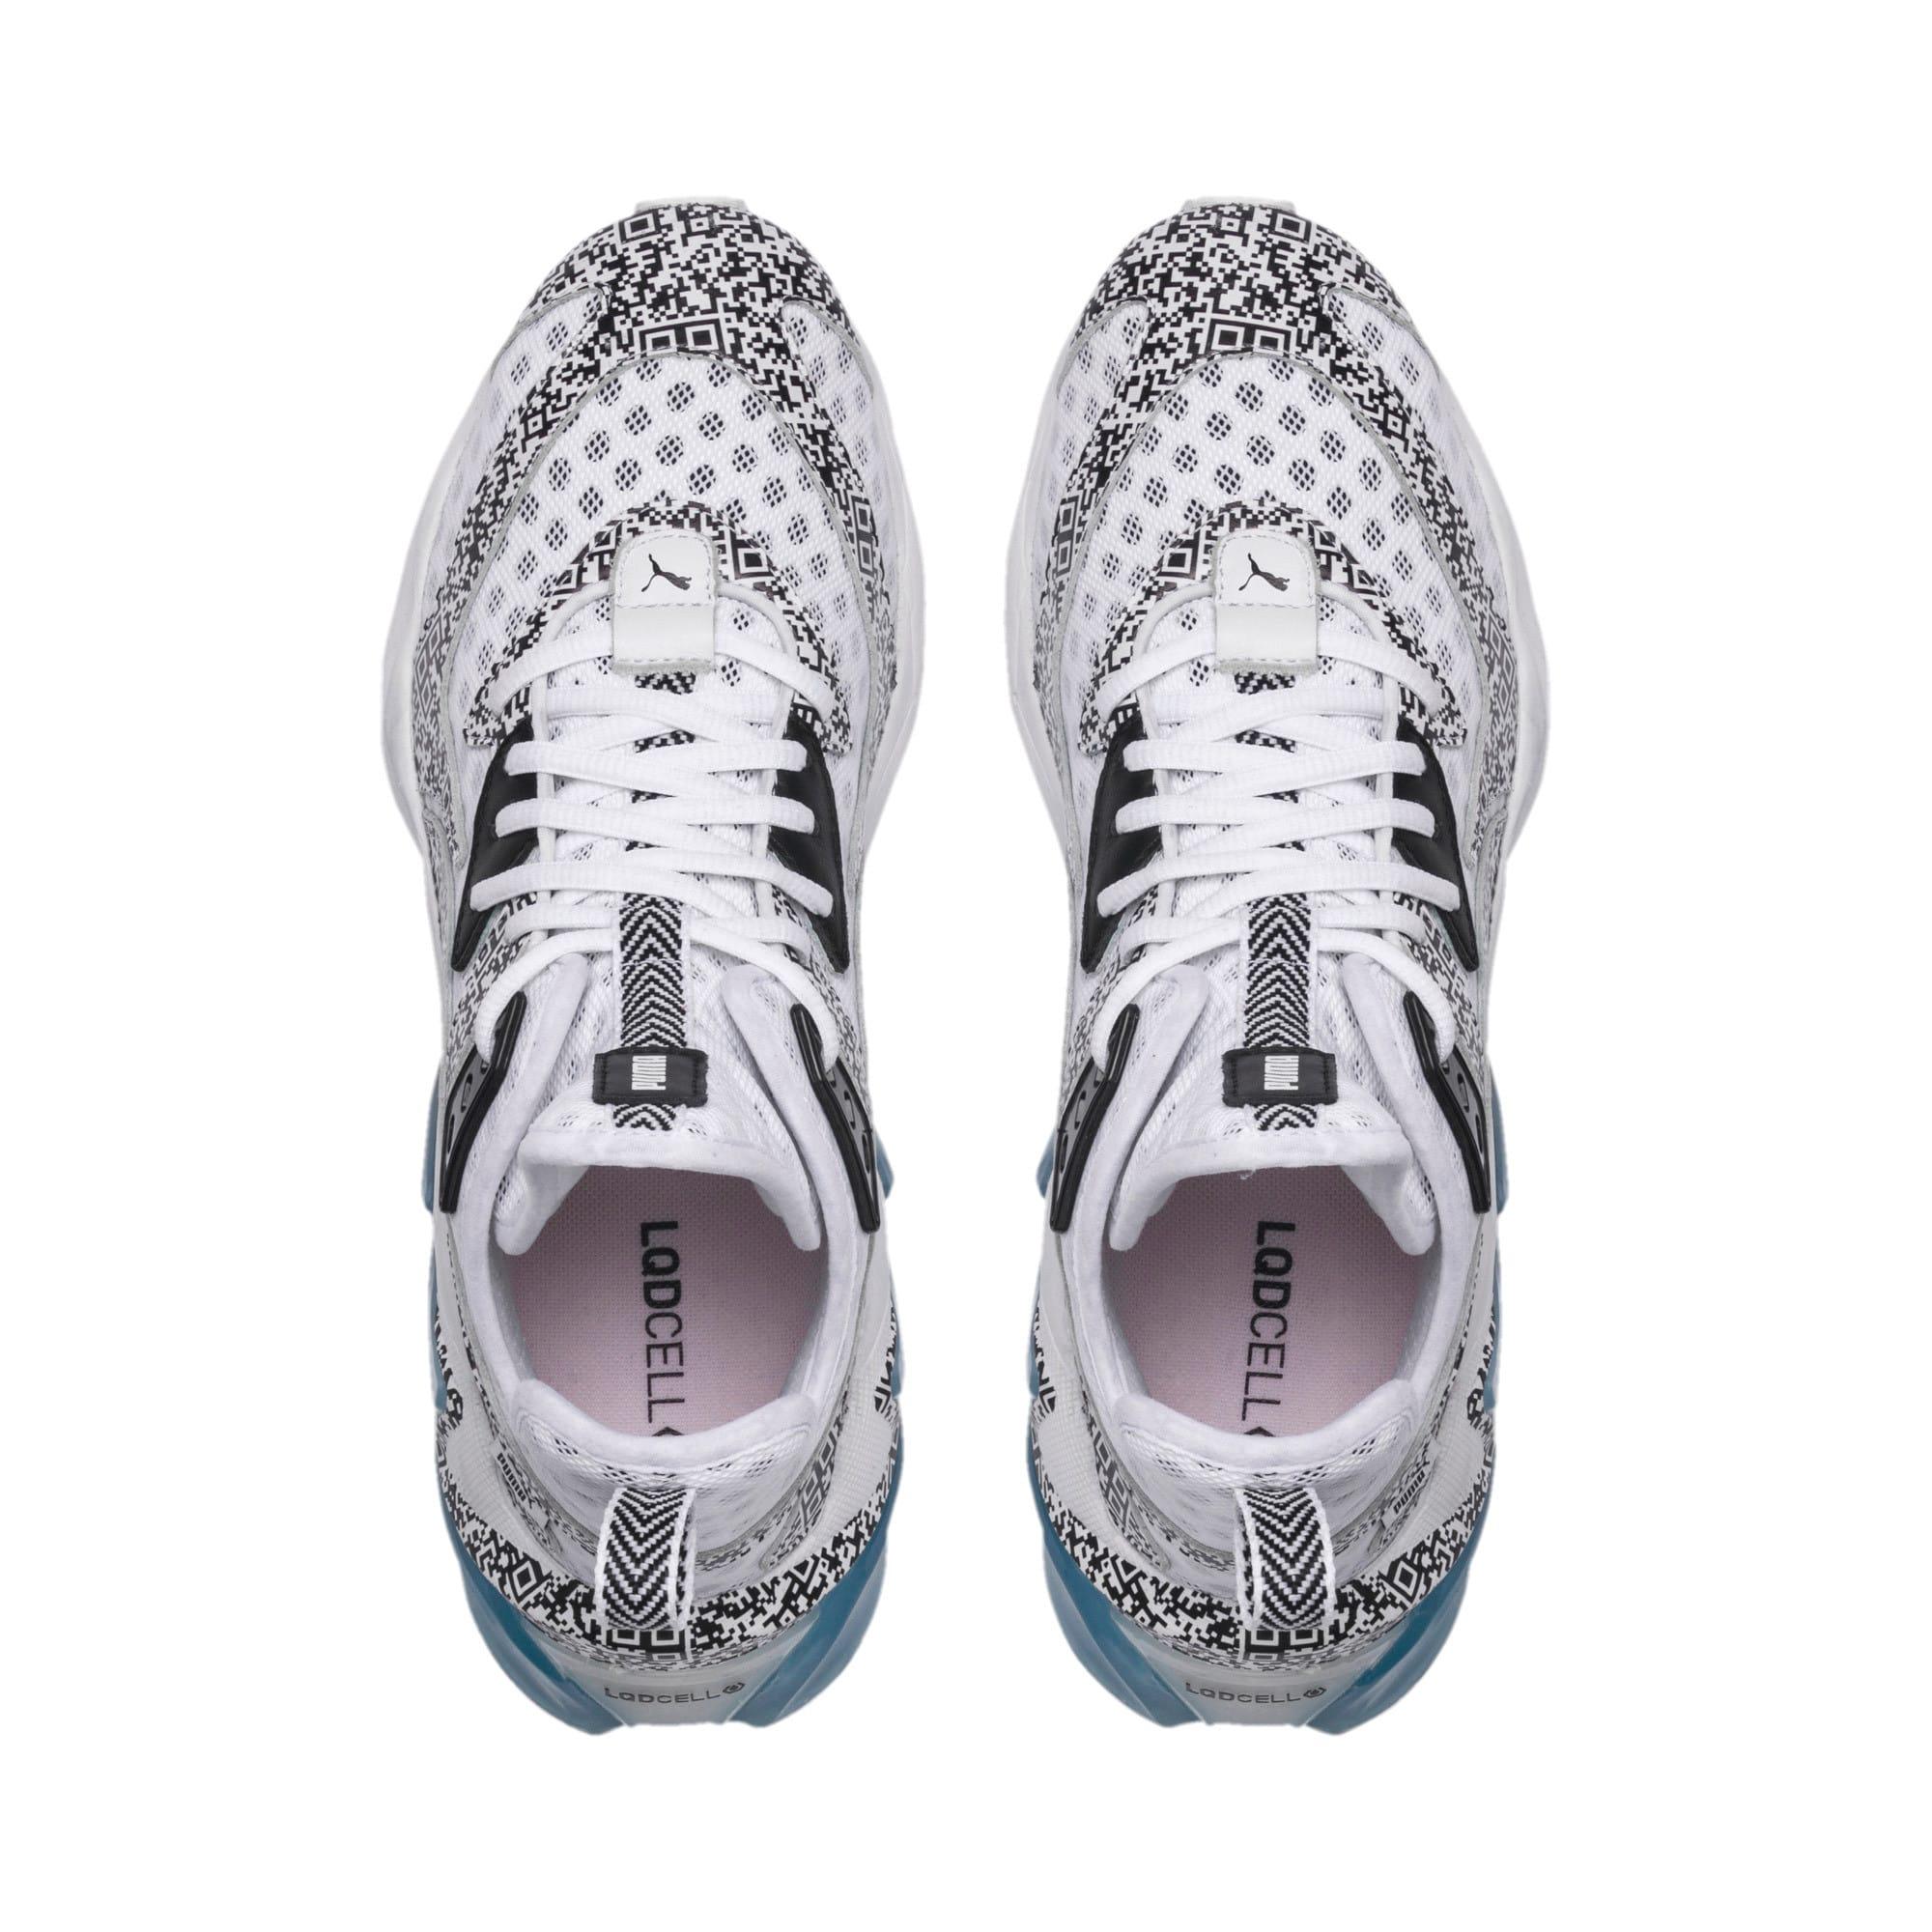 Thumbnail 6 of LQDCELL Origin AR Sneaker, Puma White-Puma Black, medium